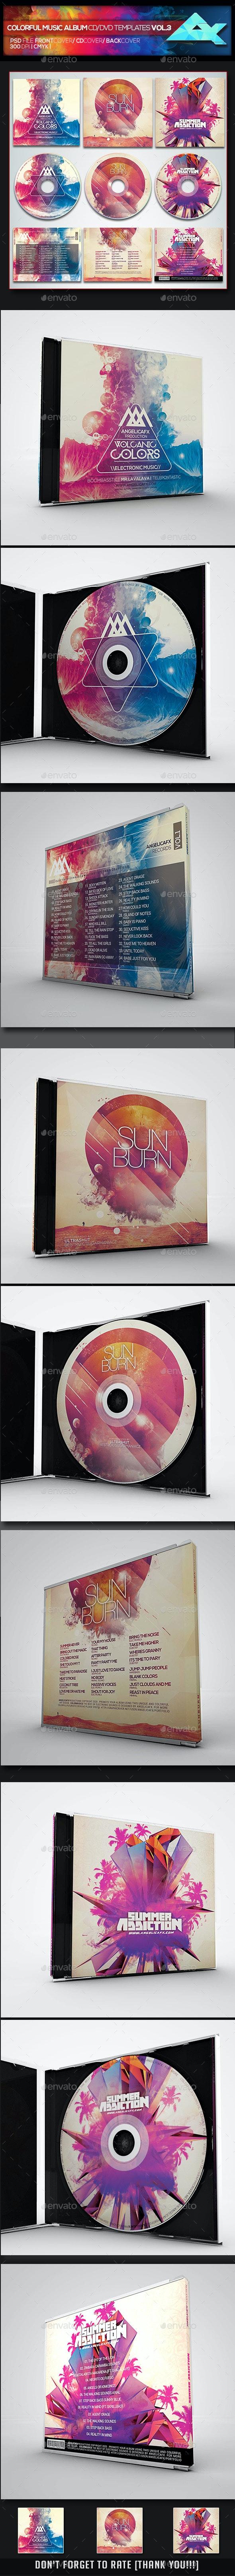 Colorful CD/DVD Album Covers Bundle Vol. 3 - CD & DVD Artwork Print Templates